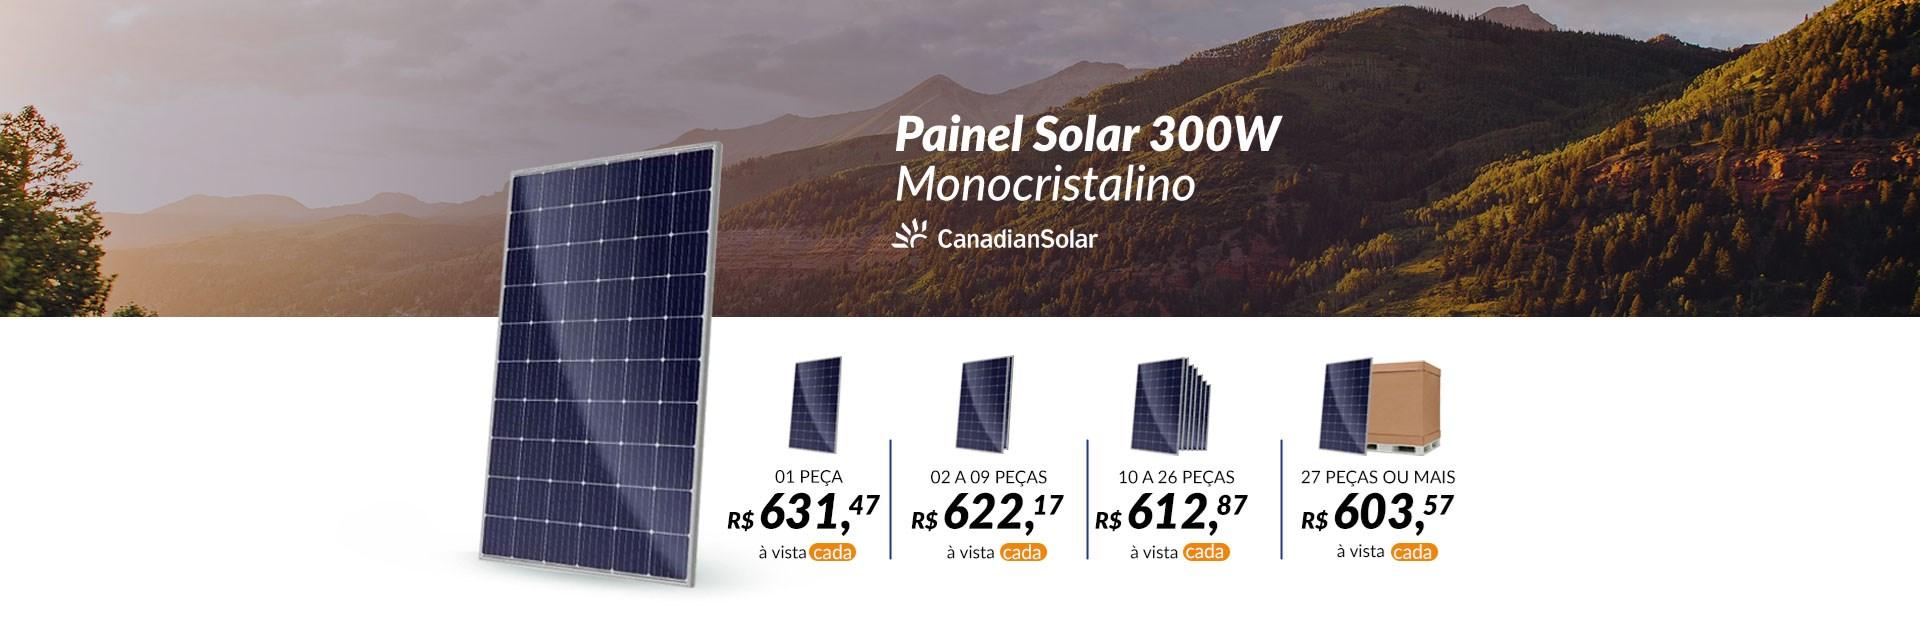 Banner Painel Solar 300W Monocristalino Canadian Solar